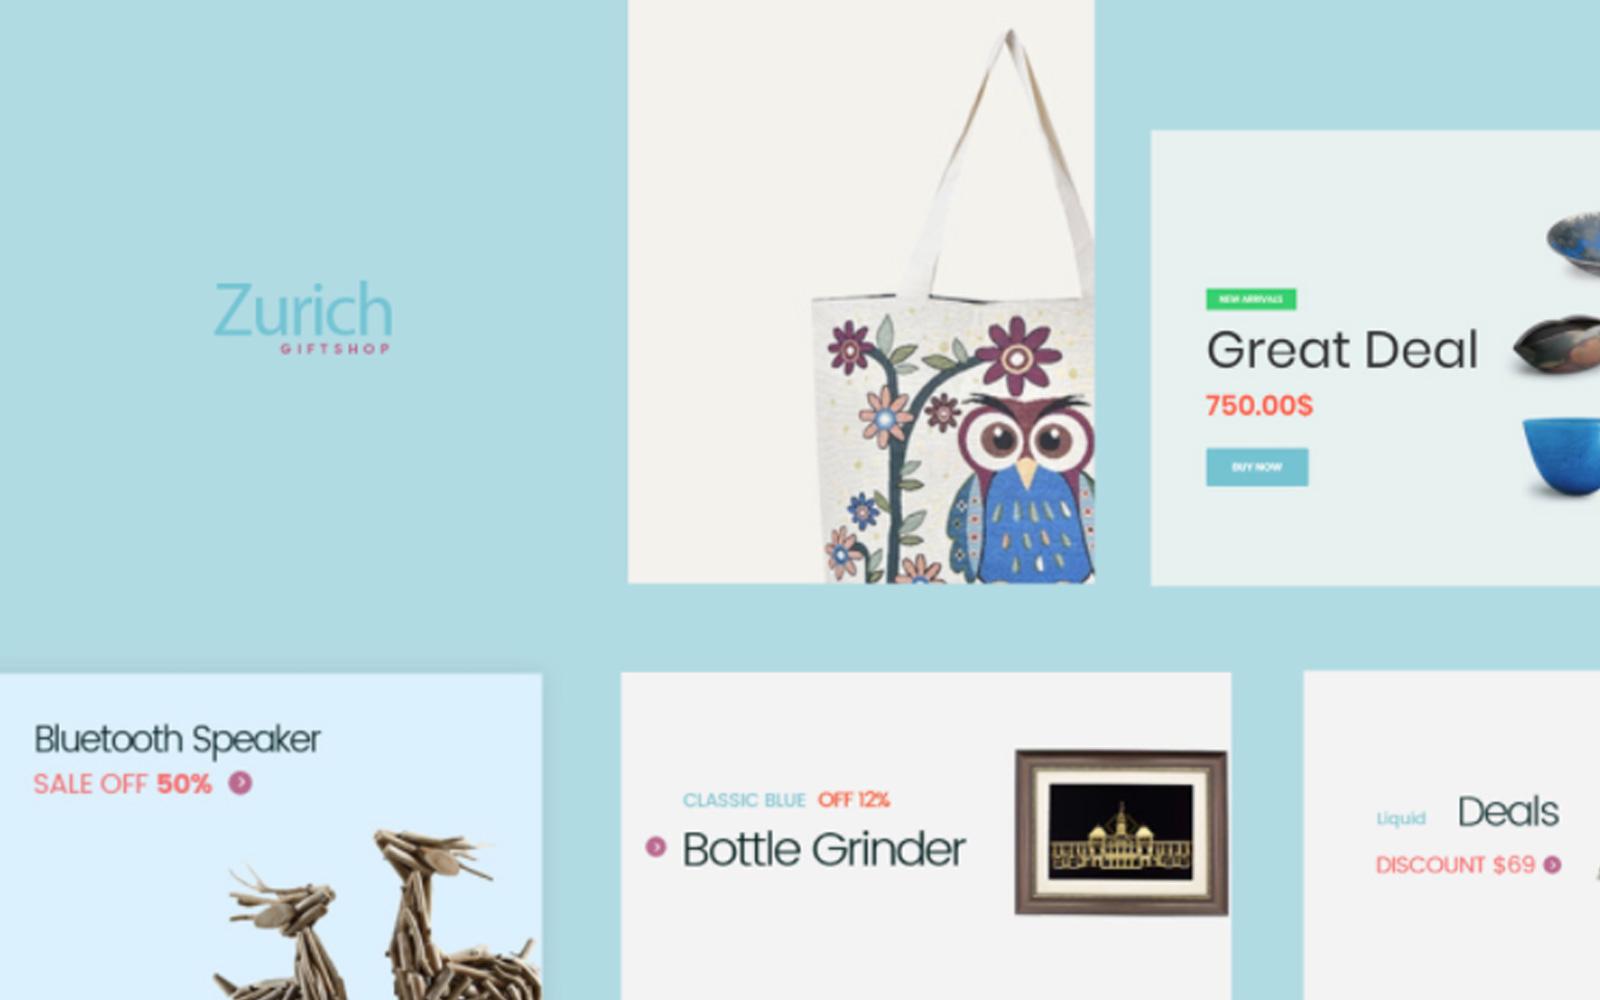 TM Zürich - Cadeaus en souvenirs PrestaShop Thema